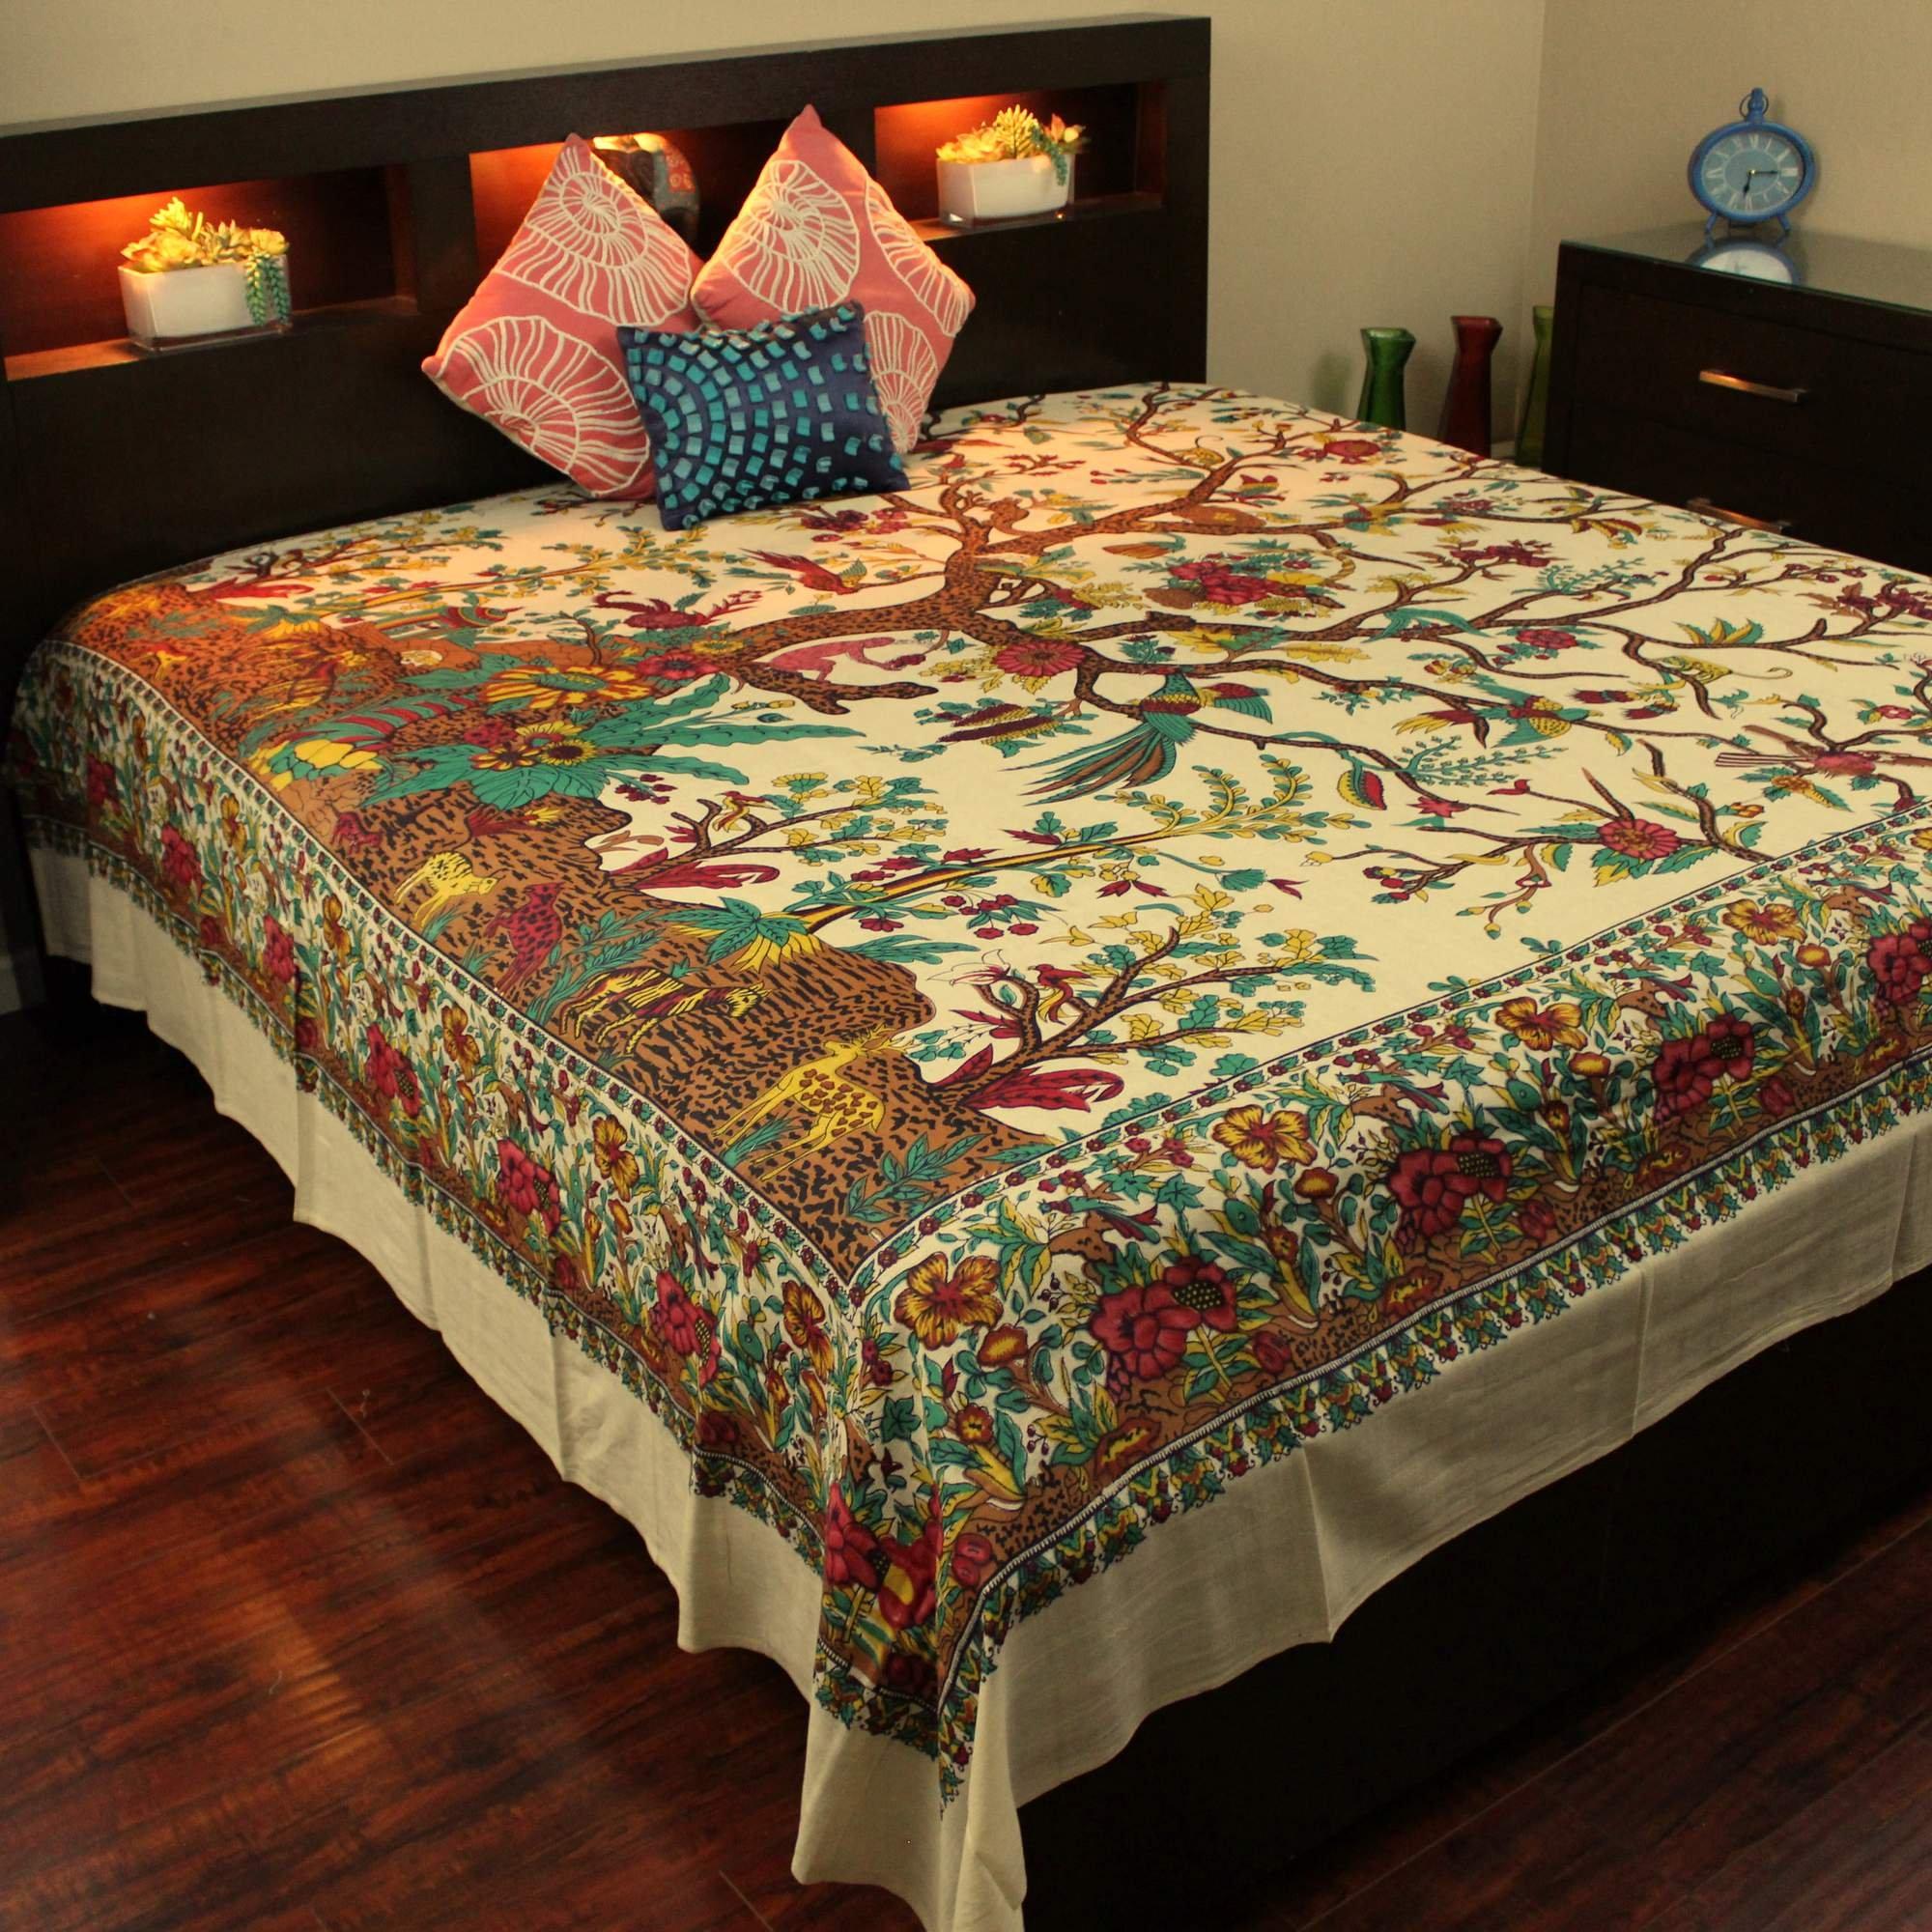 Handmade Tree of Life 100% Cotton Tapestry Tablecloth Bedspread Bed Sheet Beach Sheet Dorm Decor Tan (Full)